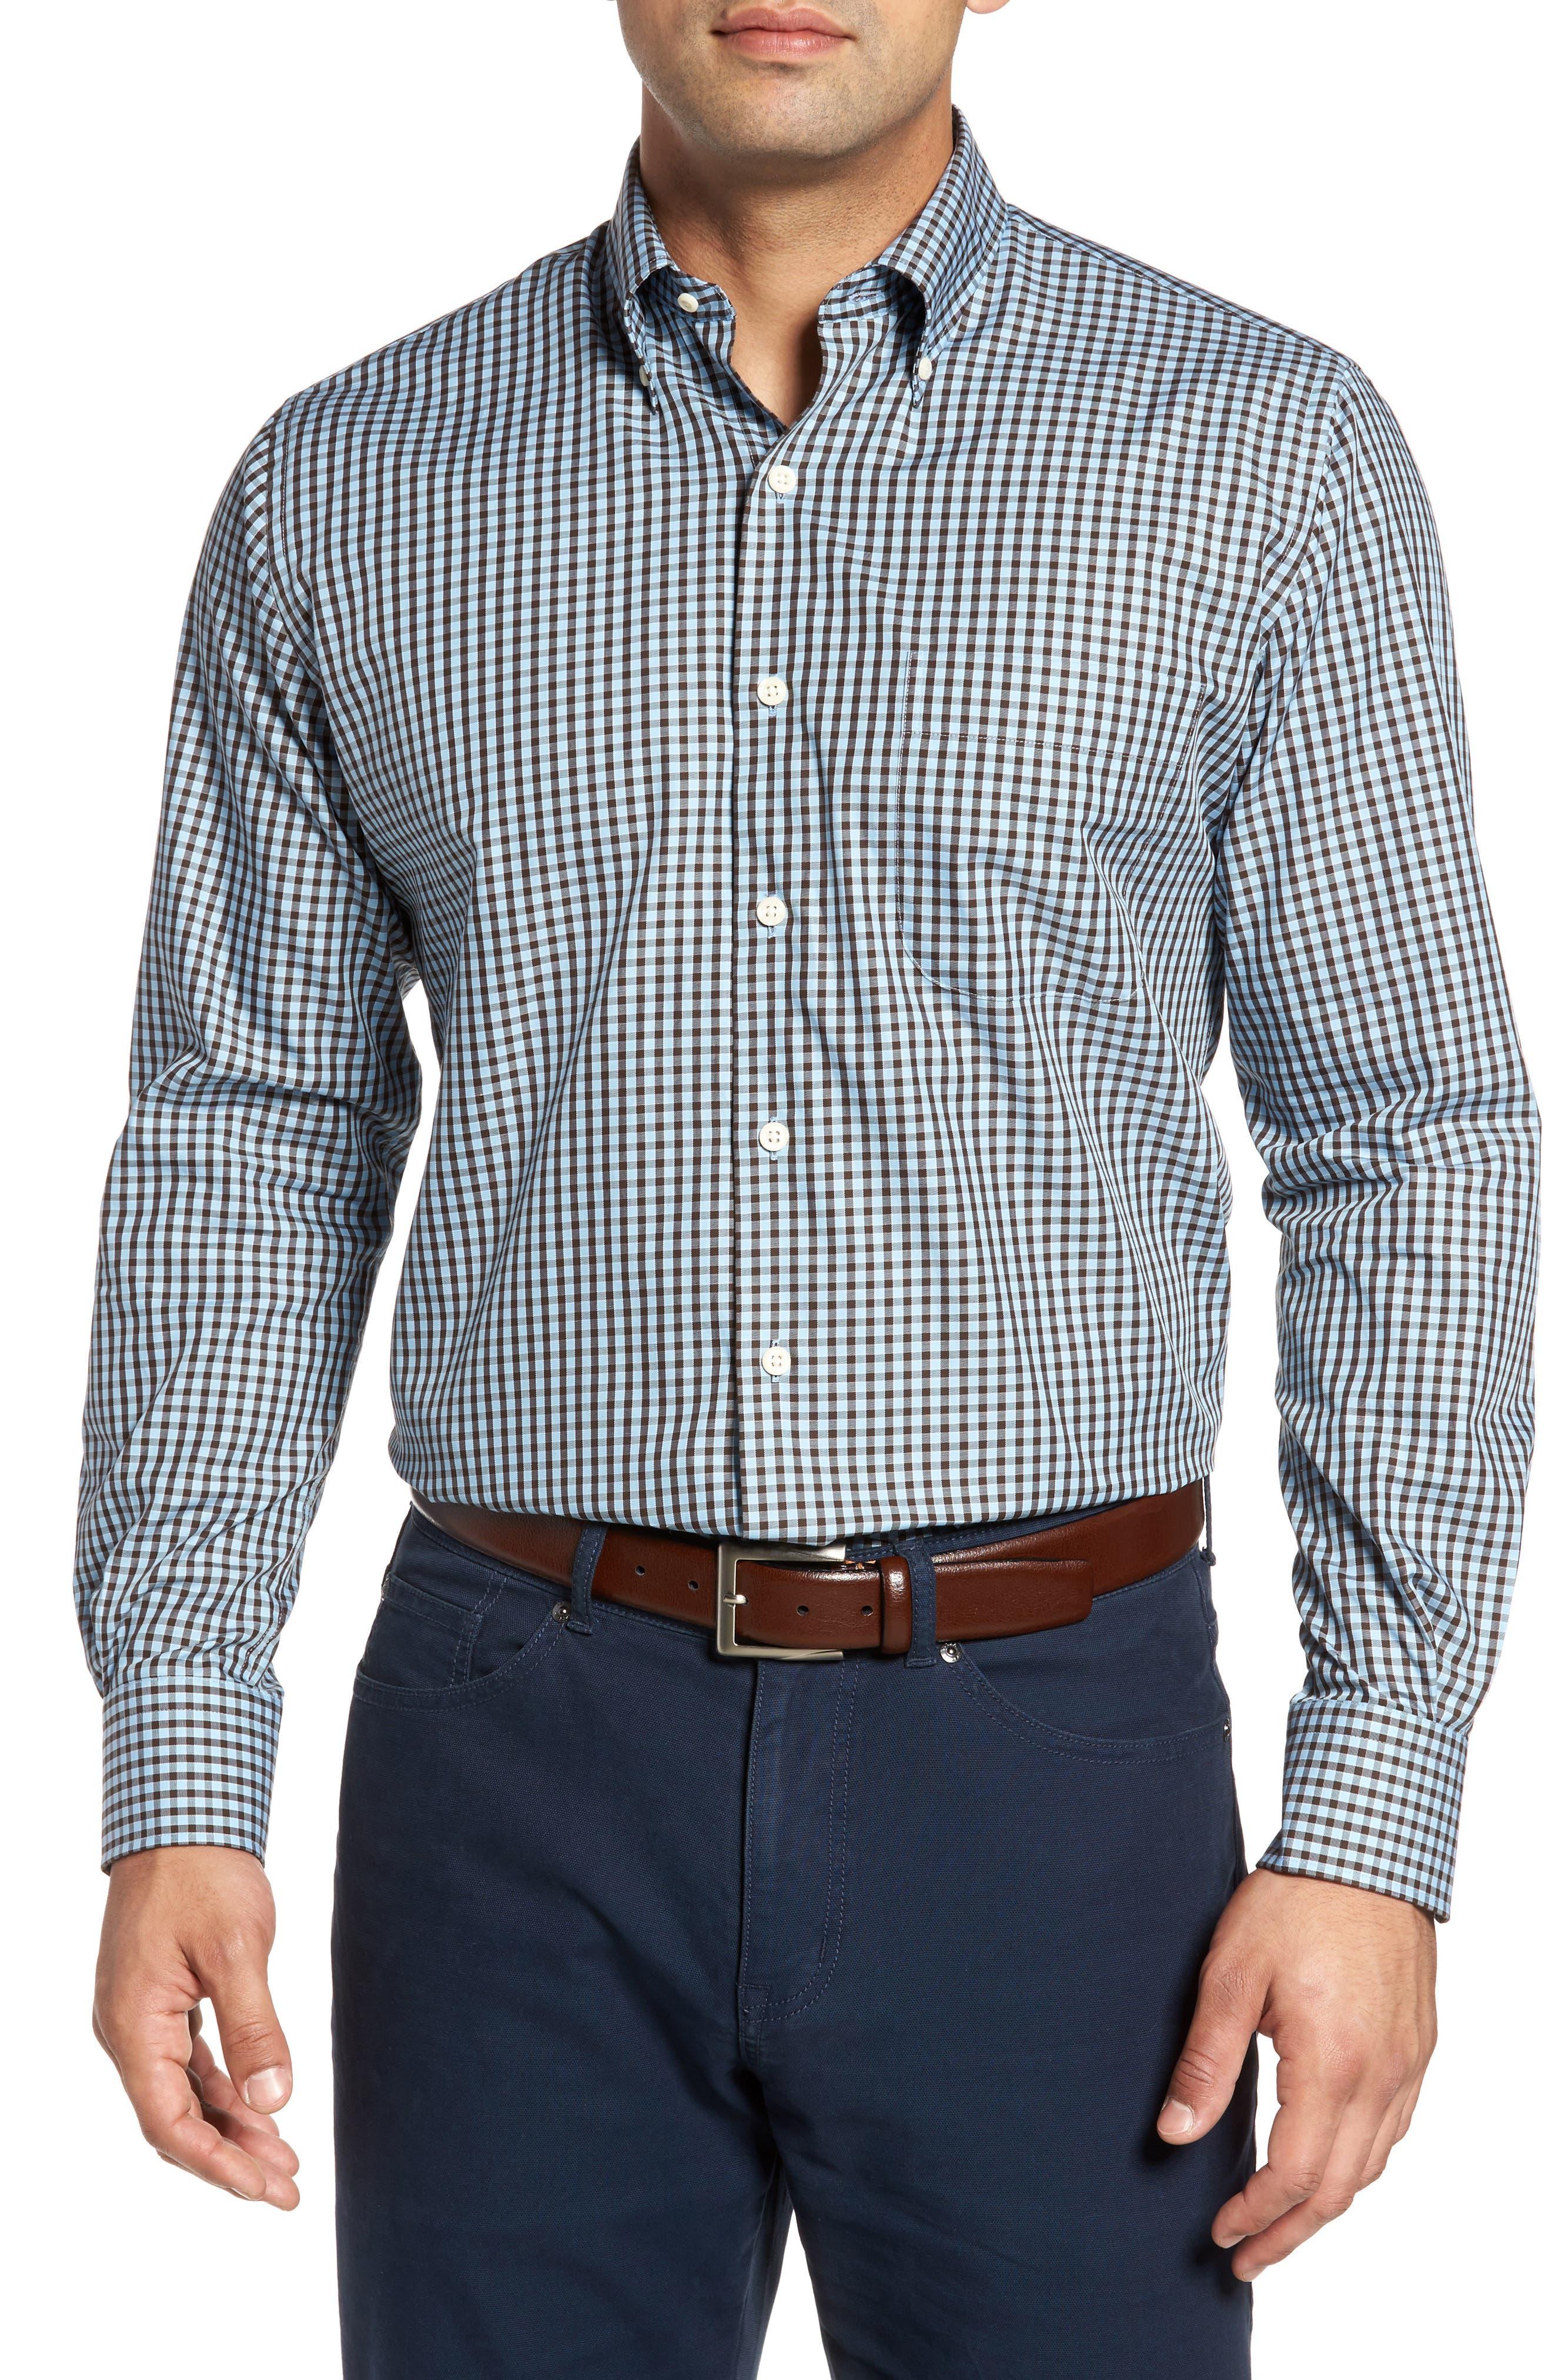 Midwinter Gingham Regular Fit Sport Shirt,                         Main,                         color, Axis Blue